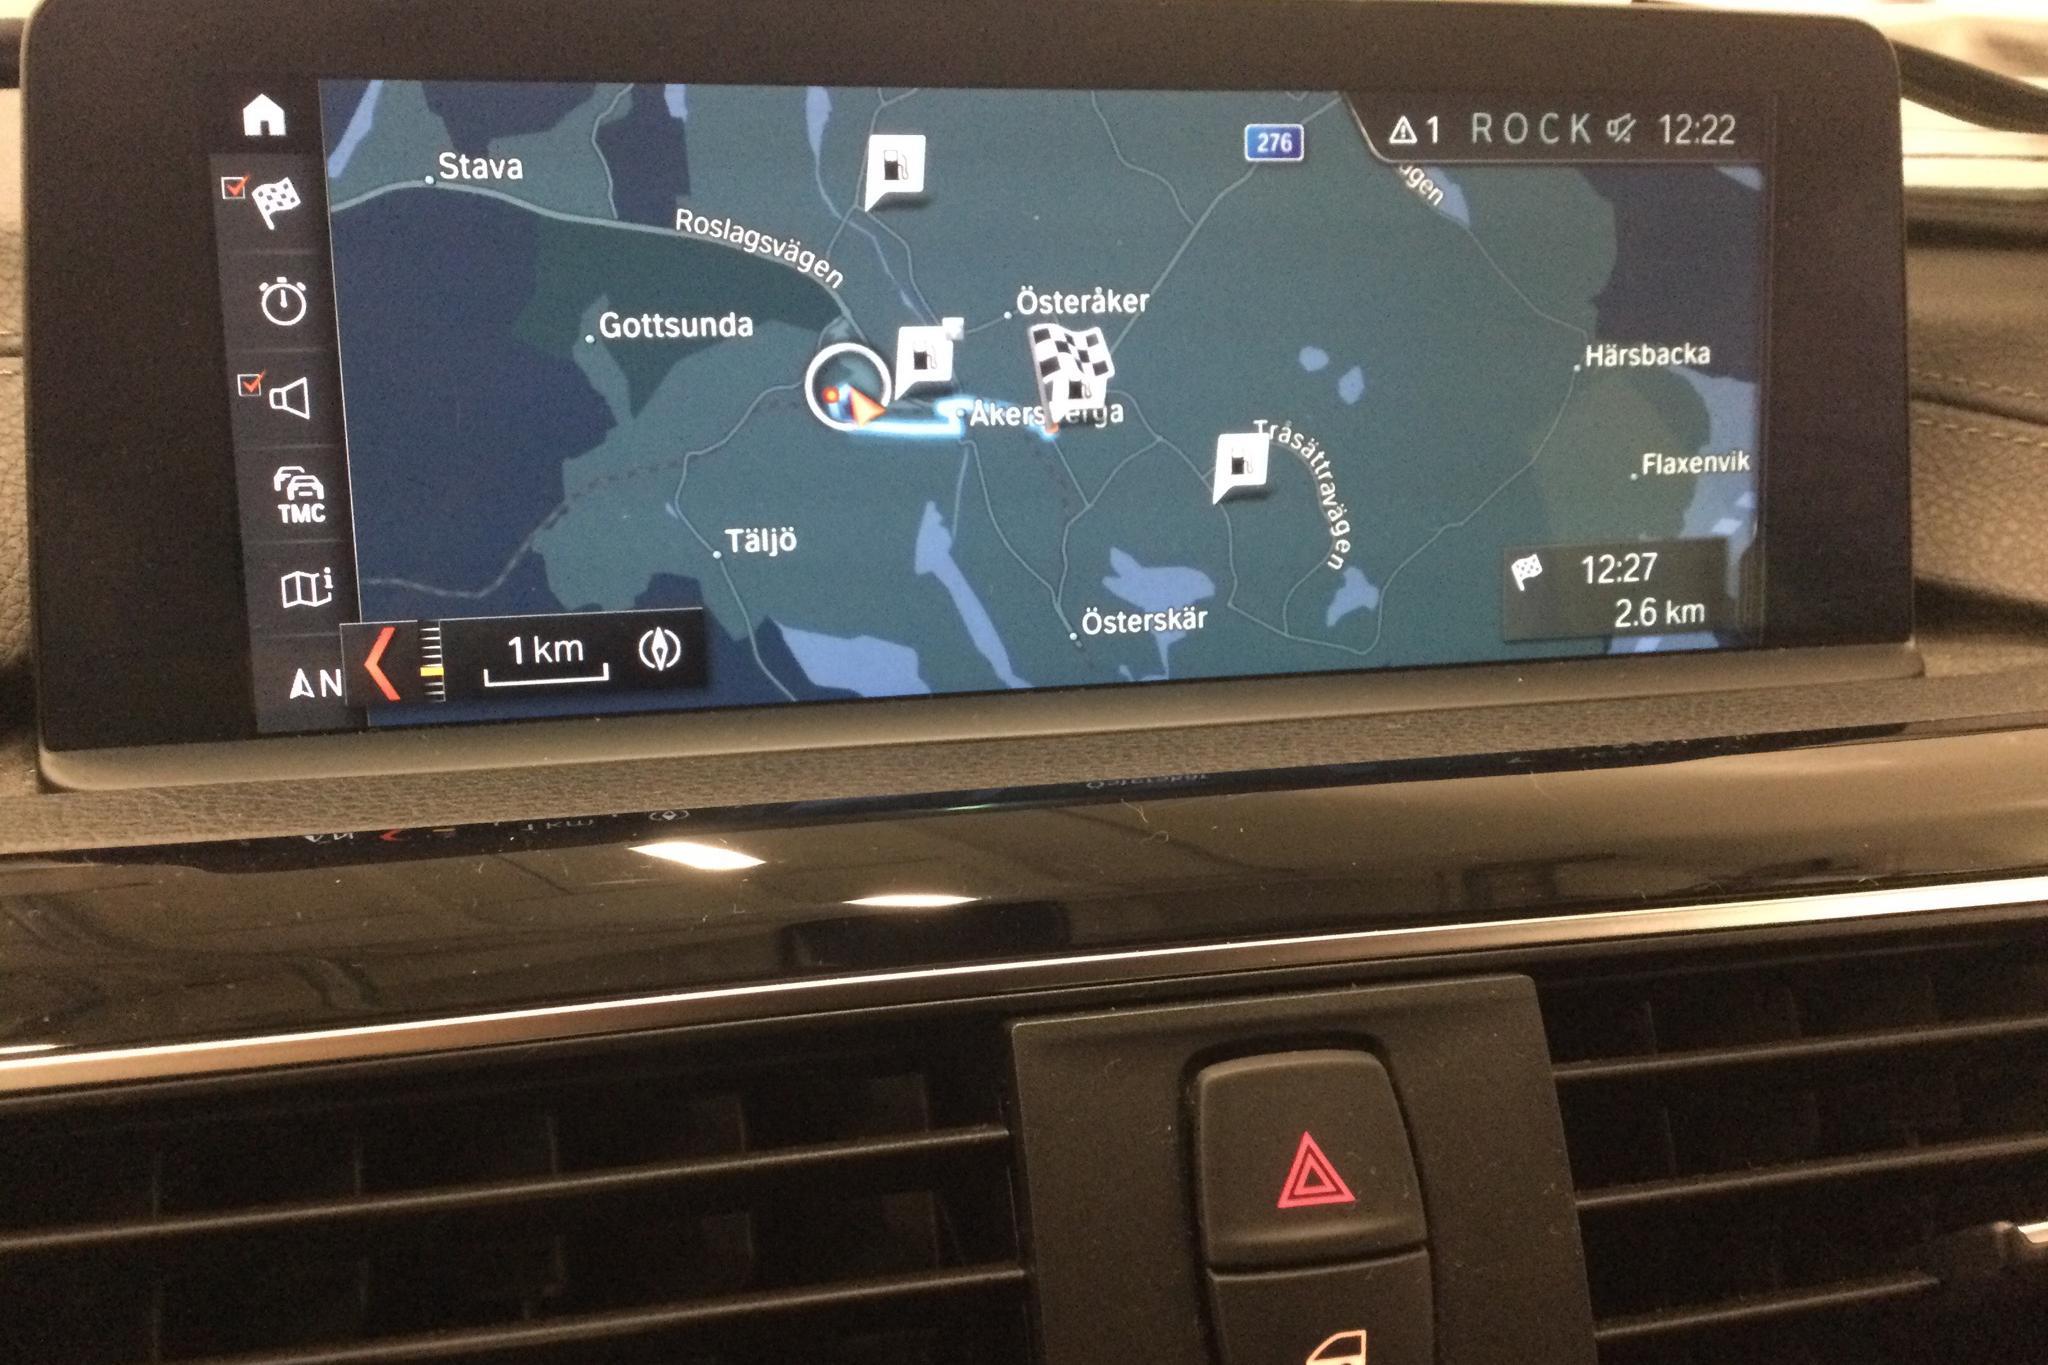 BMW 330i Touring, F31 (252hk) - 71 450 km - Automatic - black - 2018